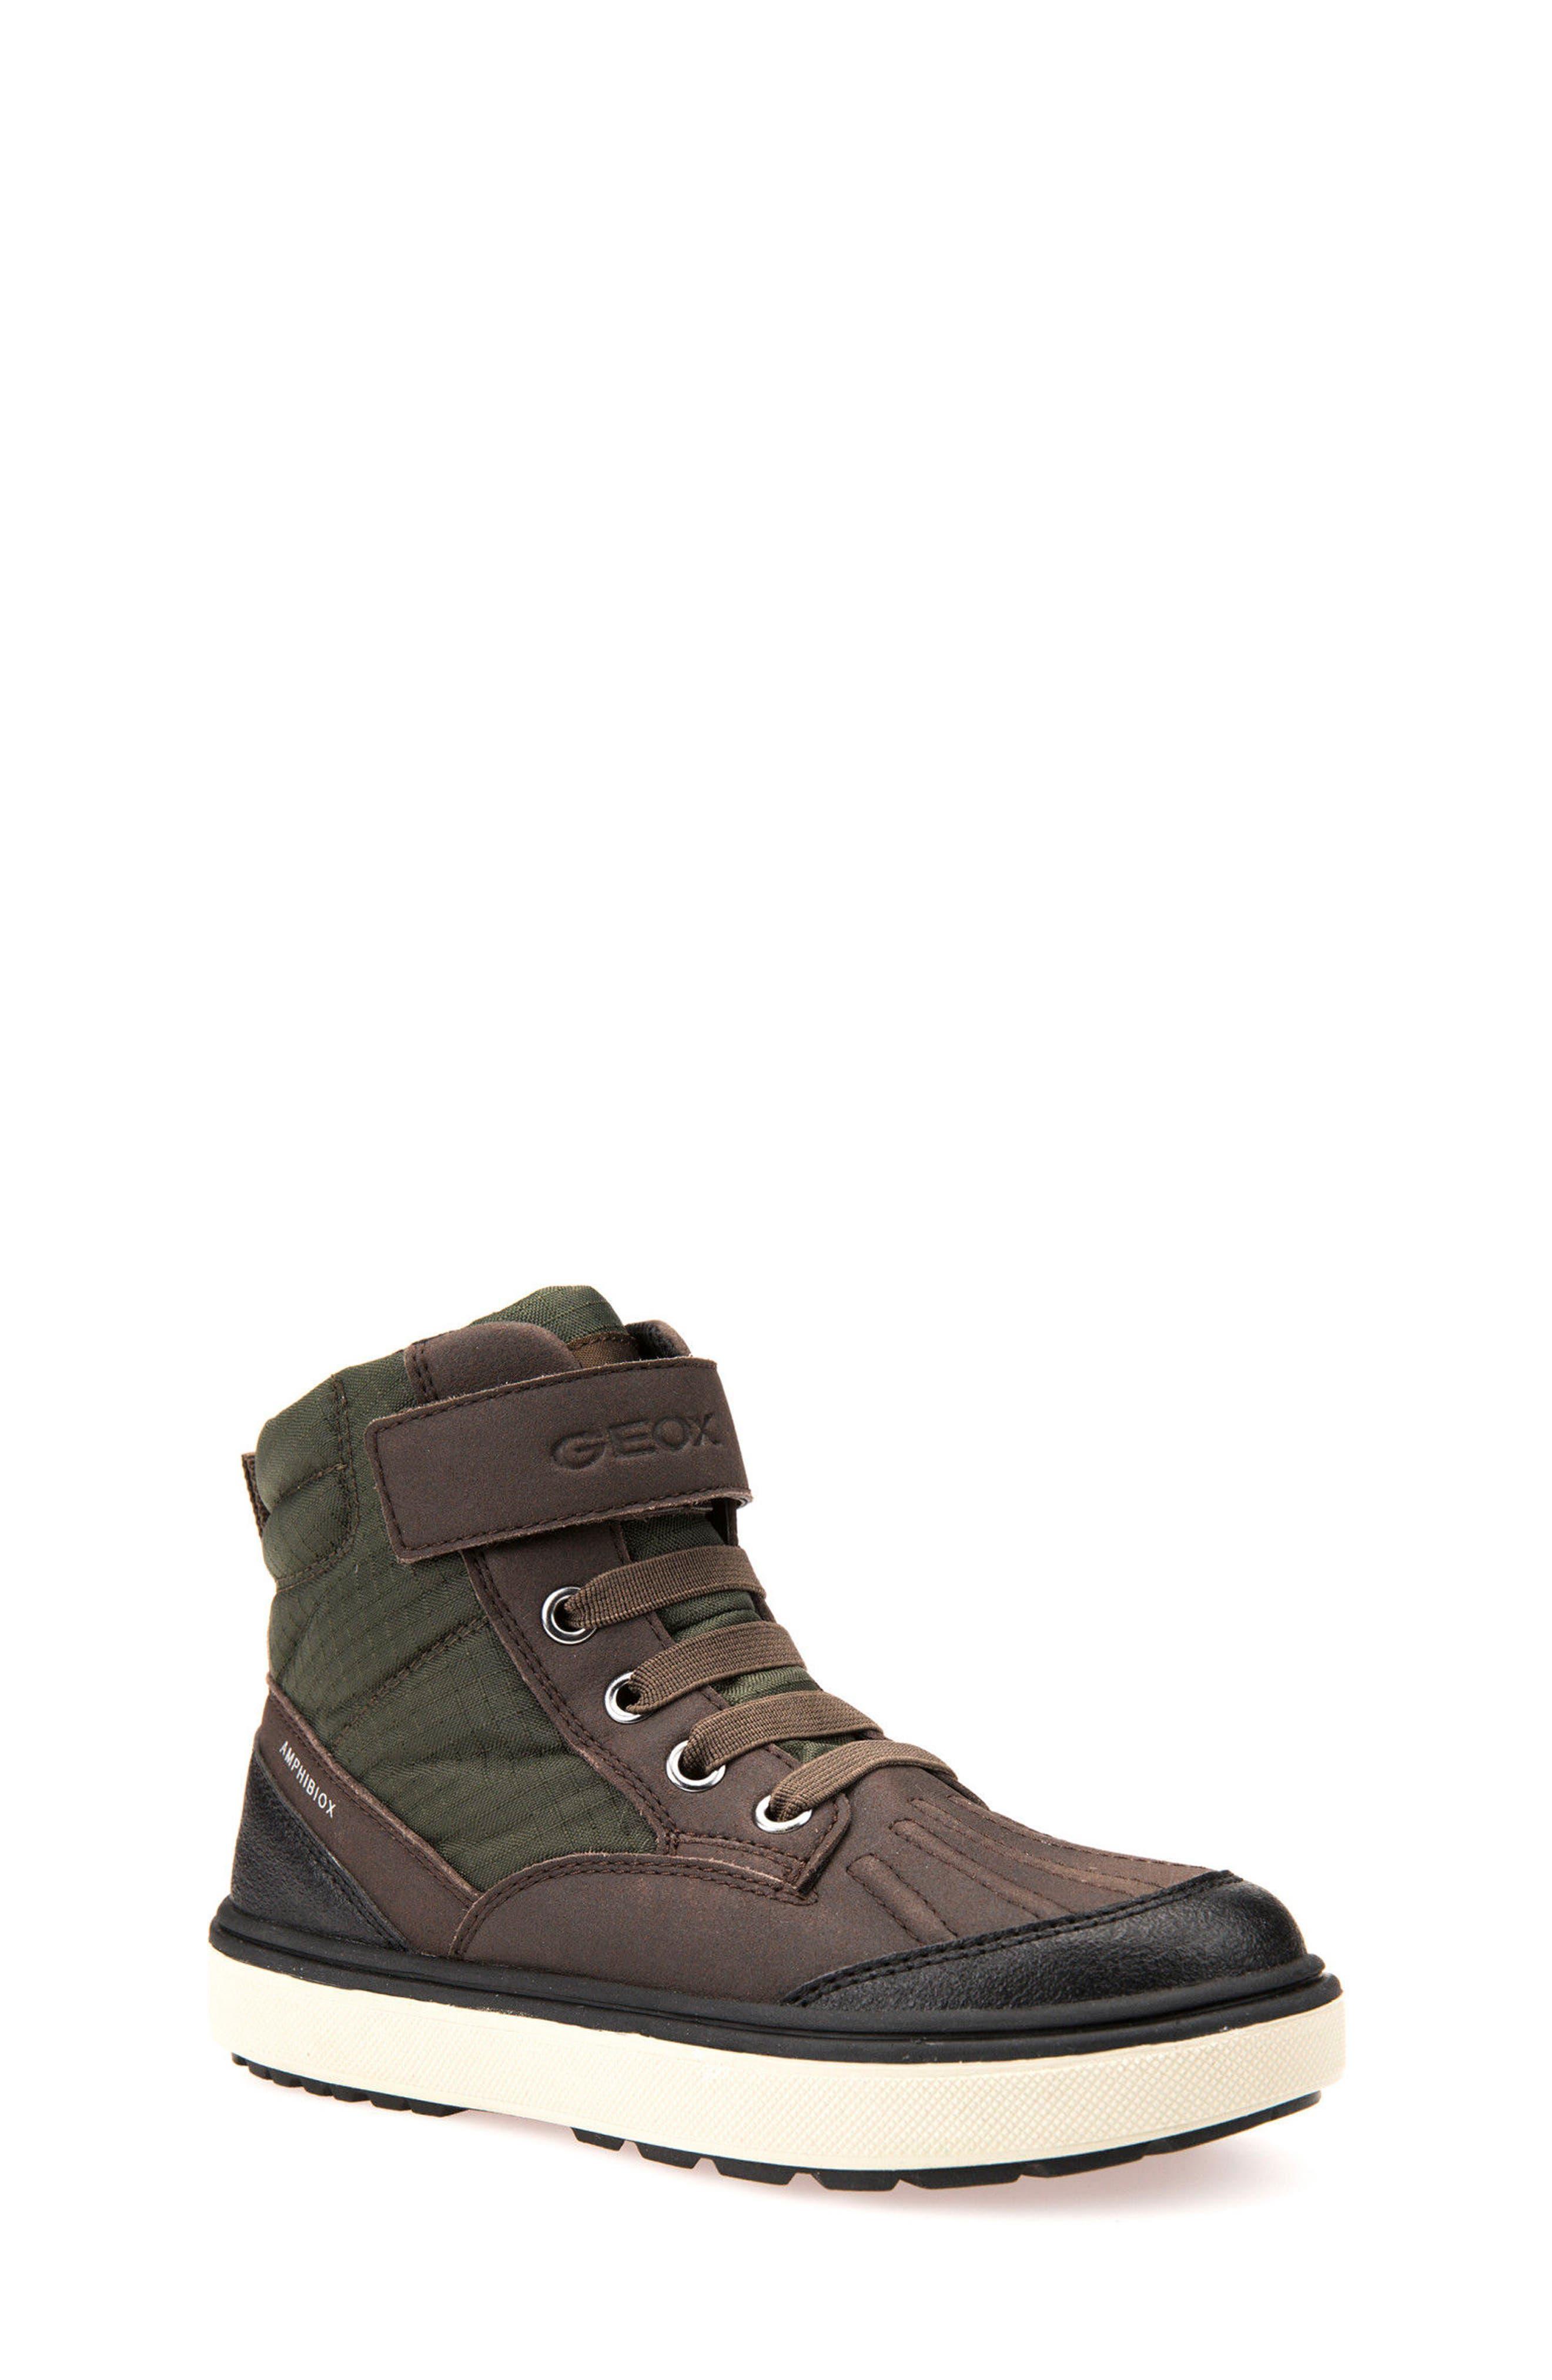 Geox 'Mattias - ABX' Amphibiox® Waterproof Sneaker (Toddler, Little Kid & Big Kid)